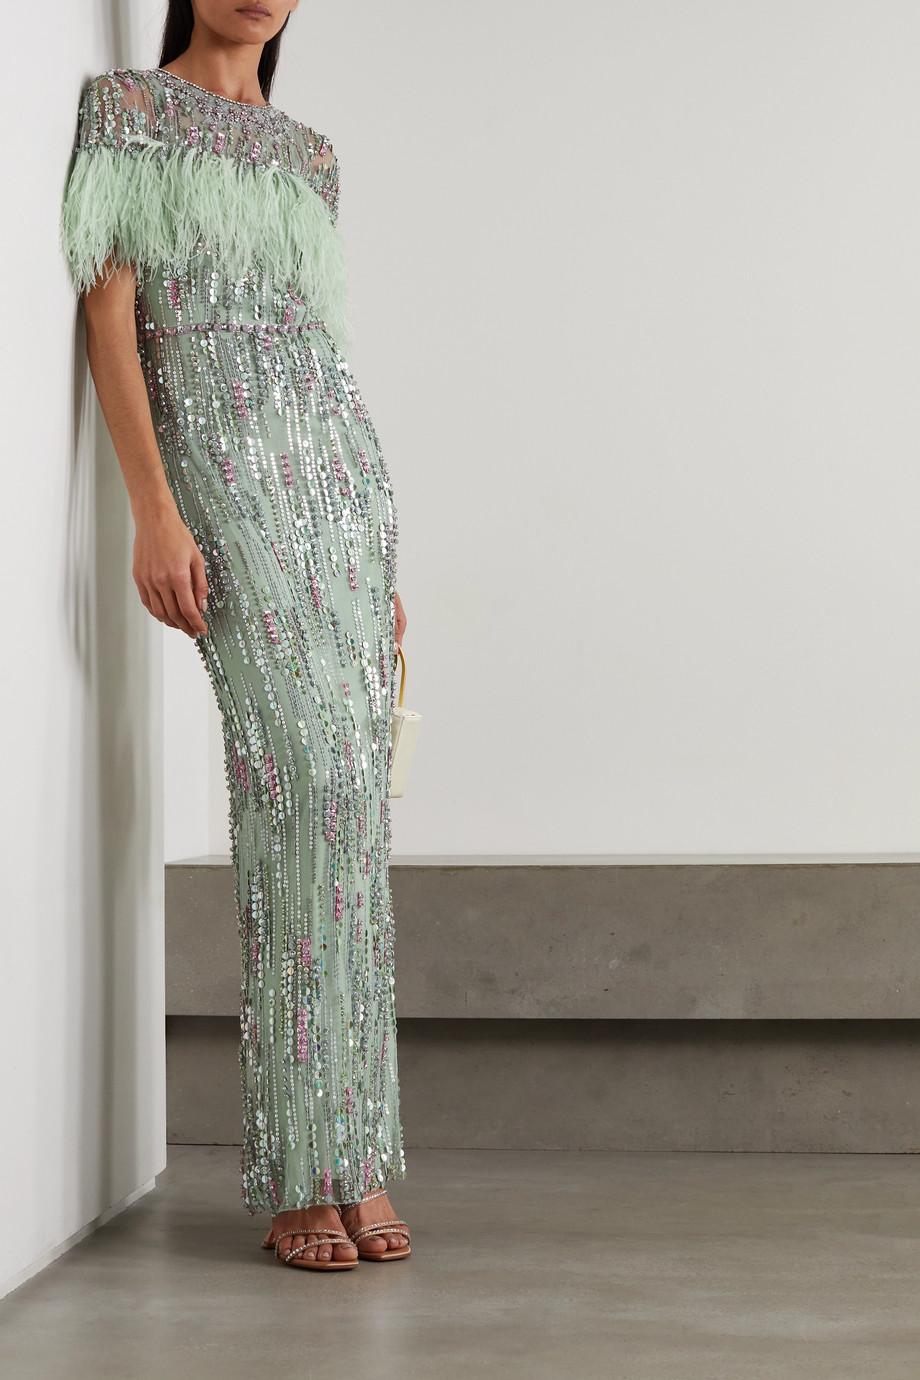 Jenny Packham Marlene feather-trimmed embellished tulle gown